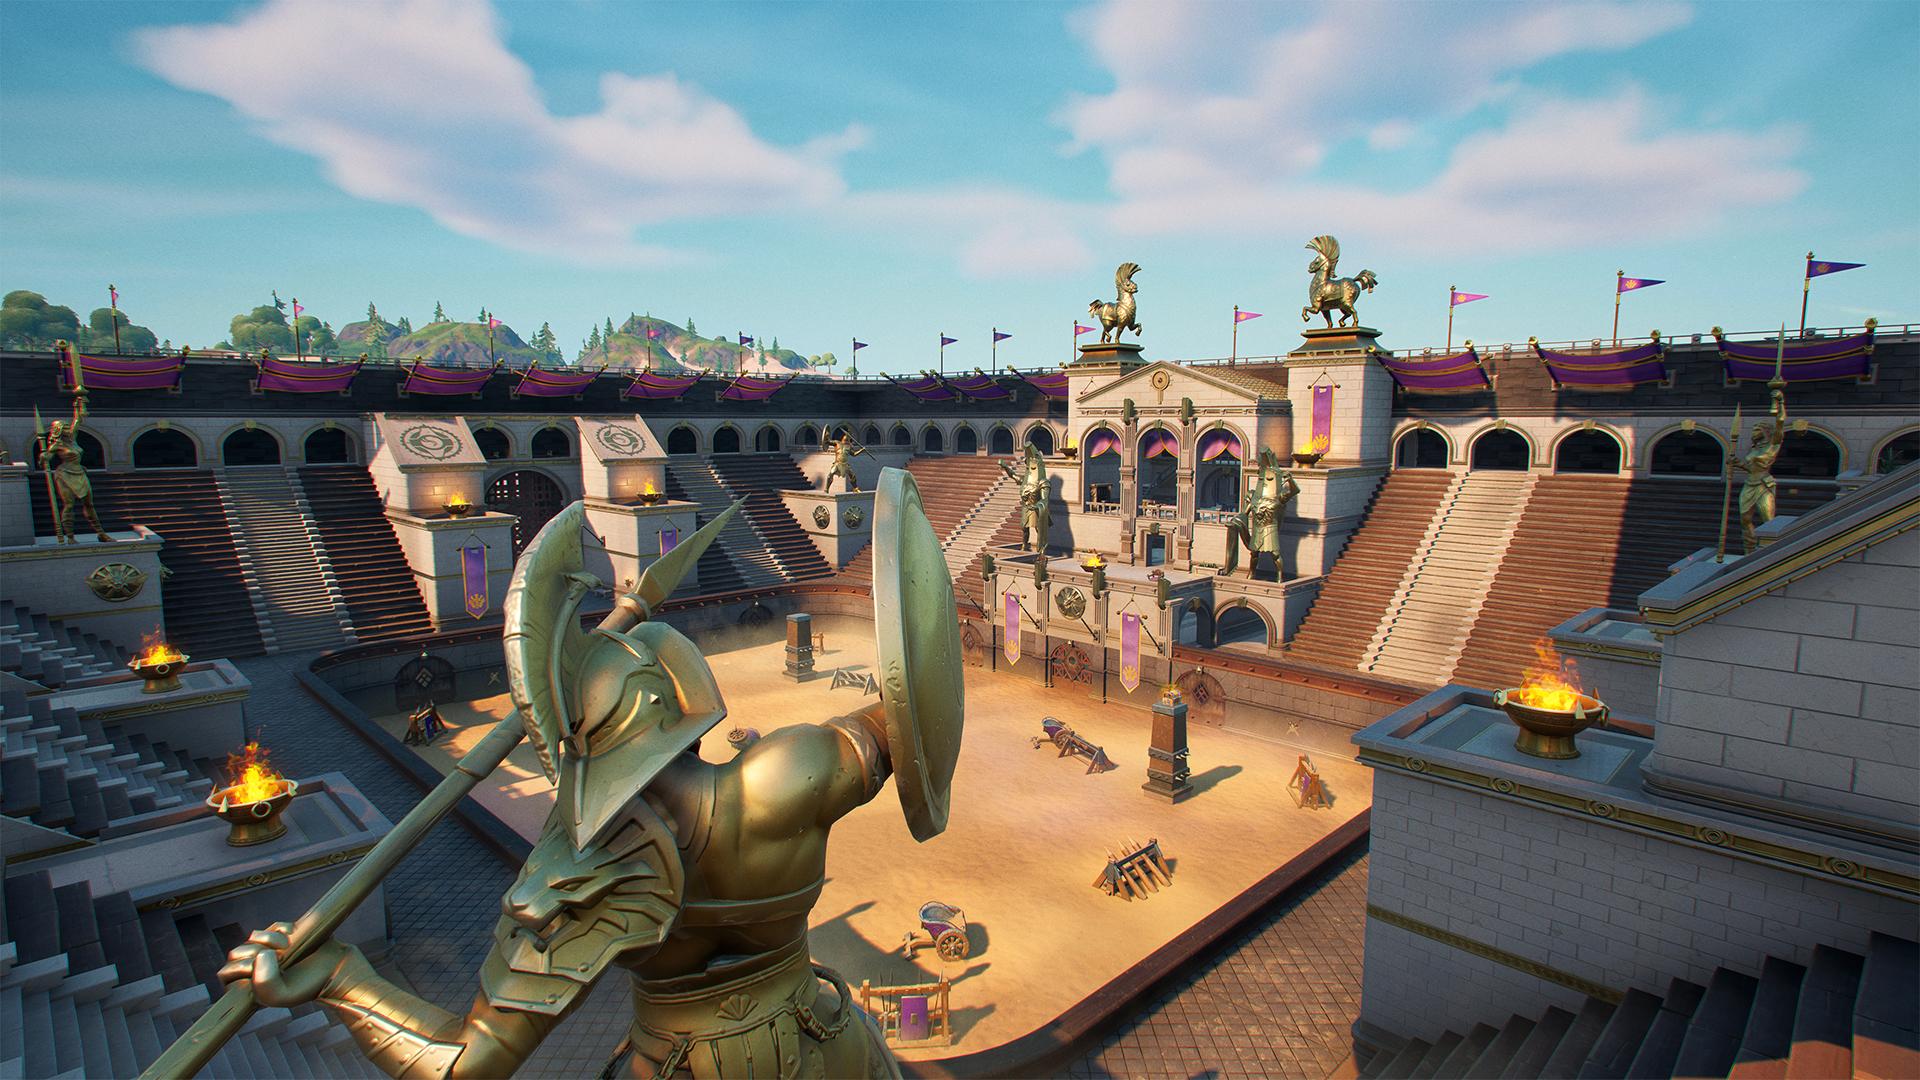 Fortnite Chapter 2 Map Reddit Fortnite Chapter 2 Season 5 Map Changes Giant Coliseum Salty Tower Etc Jioforme